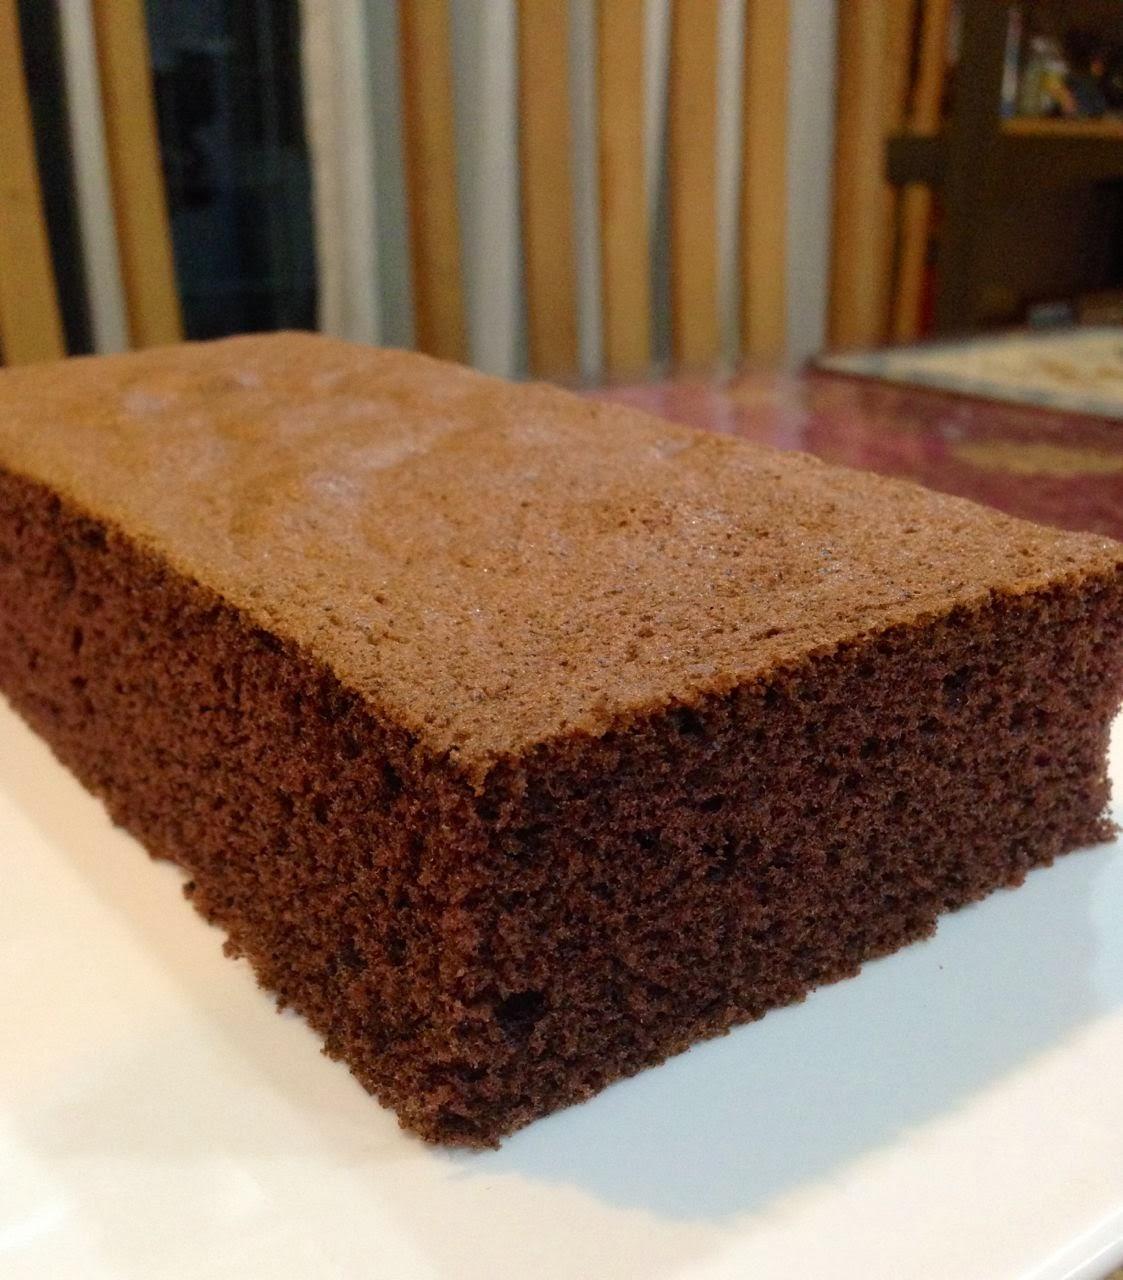 Baking Diary: Chocolate Sponge Cake